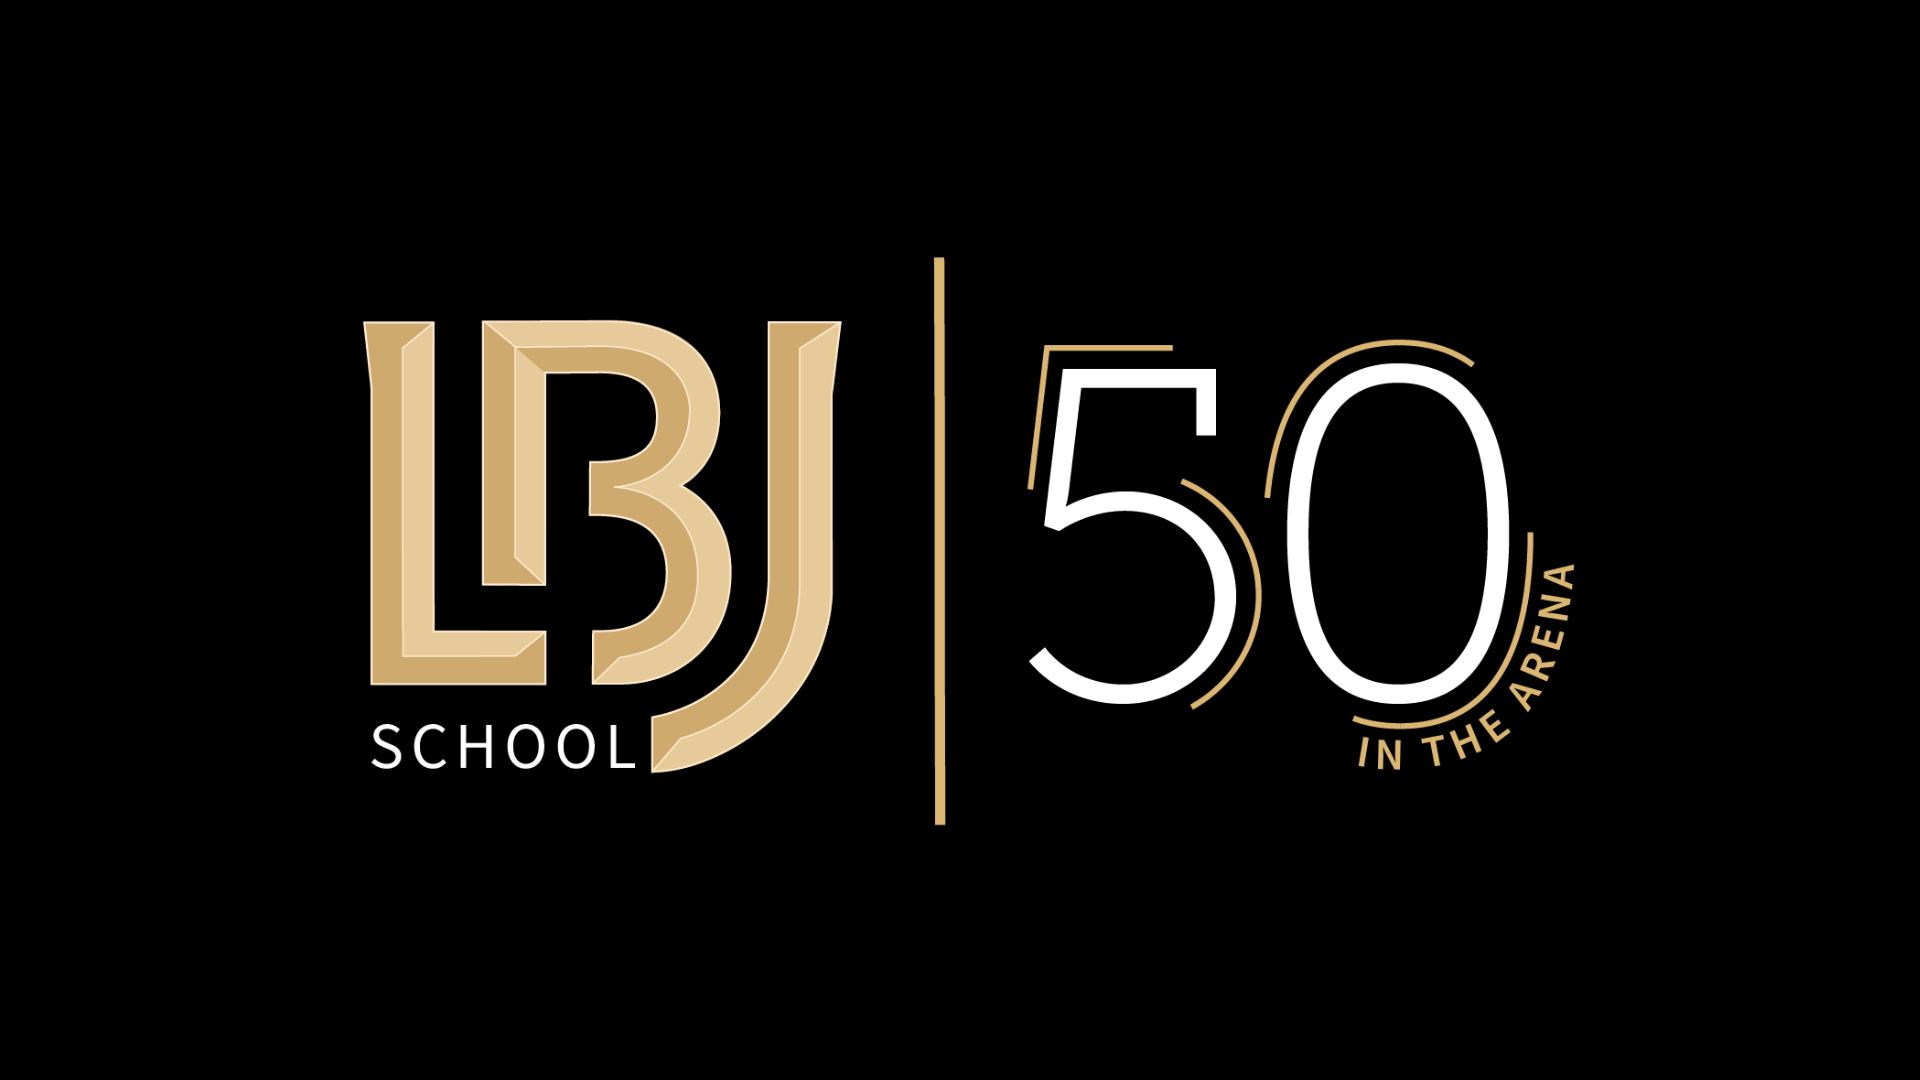 LBJ School 50th Anniversary logo